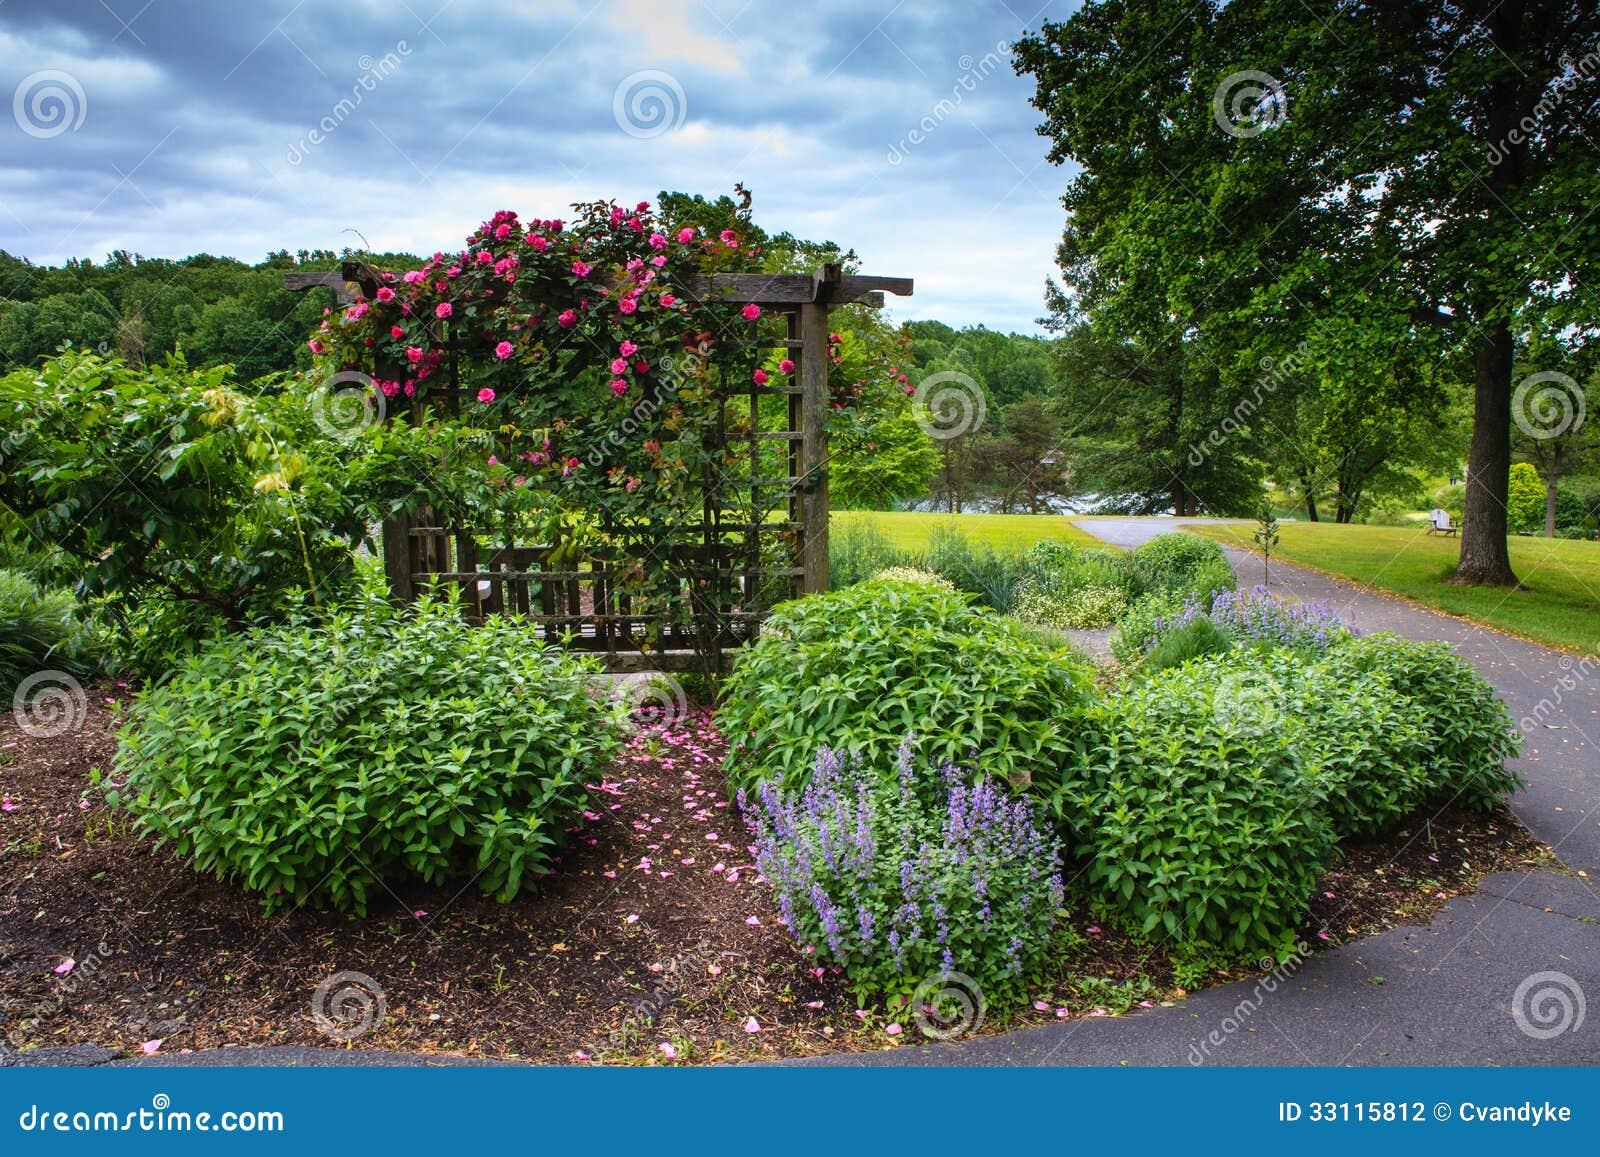 trellis shelters a bench in a hillside garden in Virginia where ...